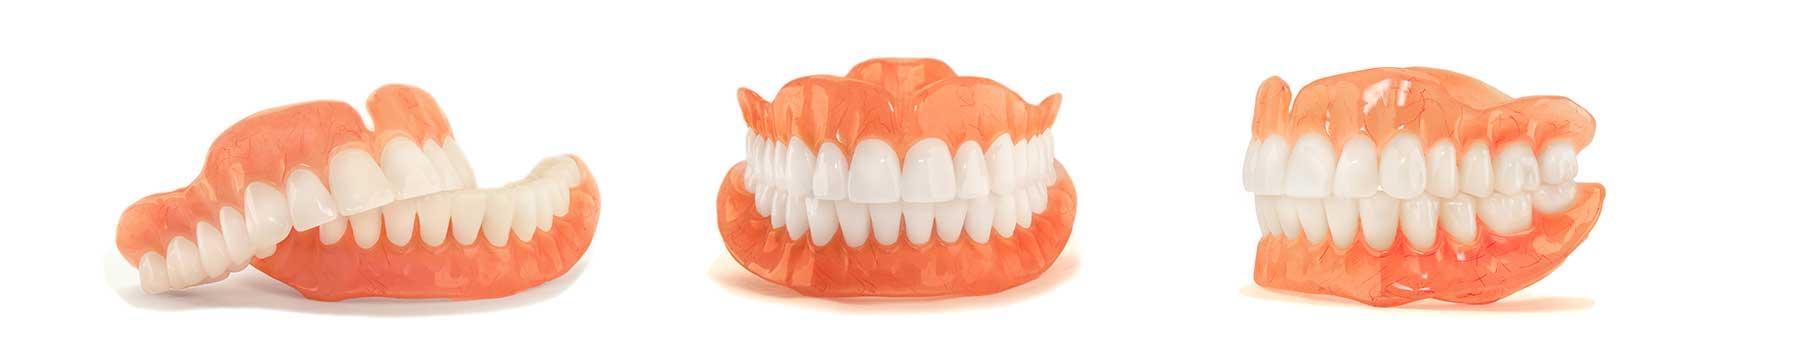 complete set of full dentures